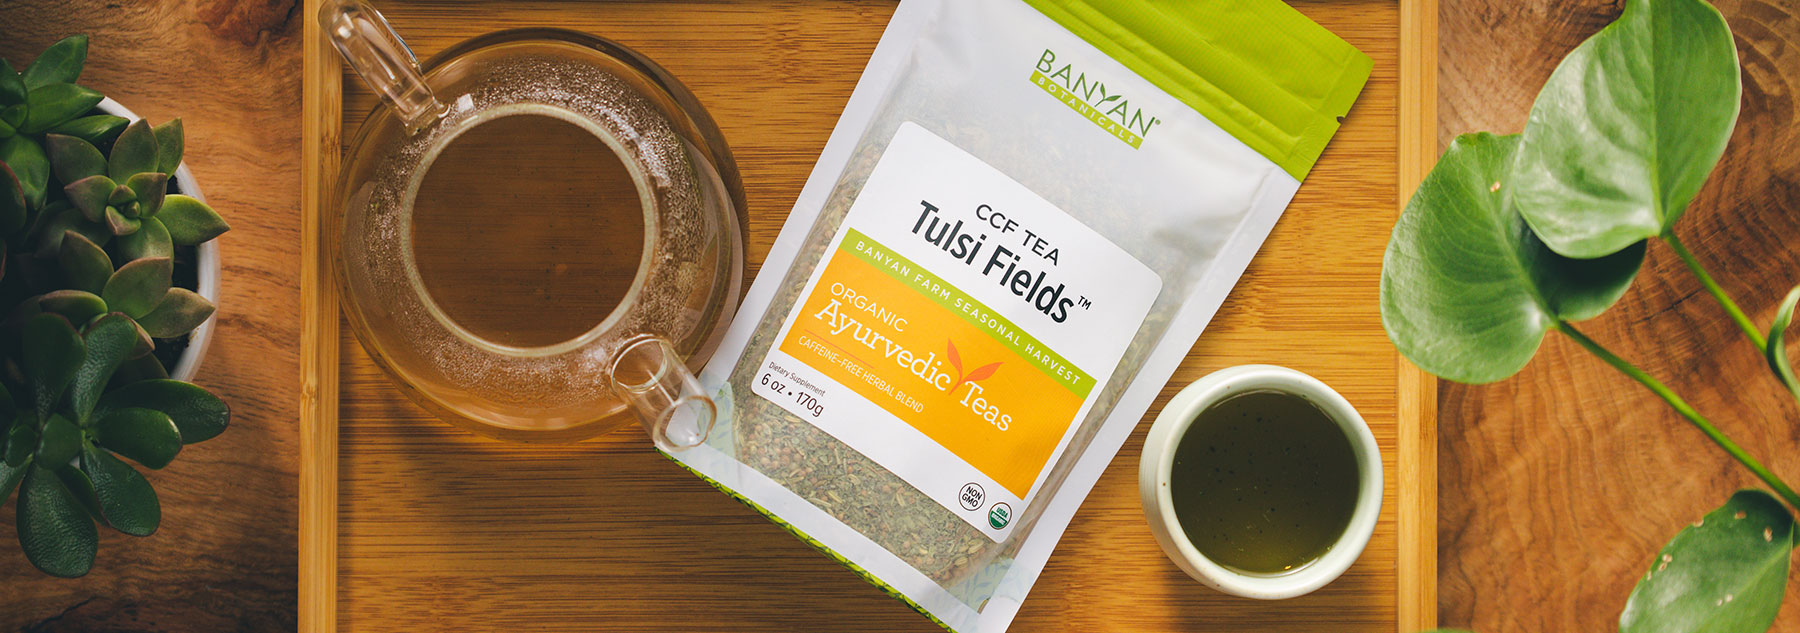 New! CCF Tulsi Fields Tea Is Bursting with Prana